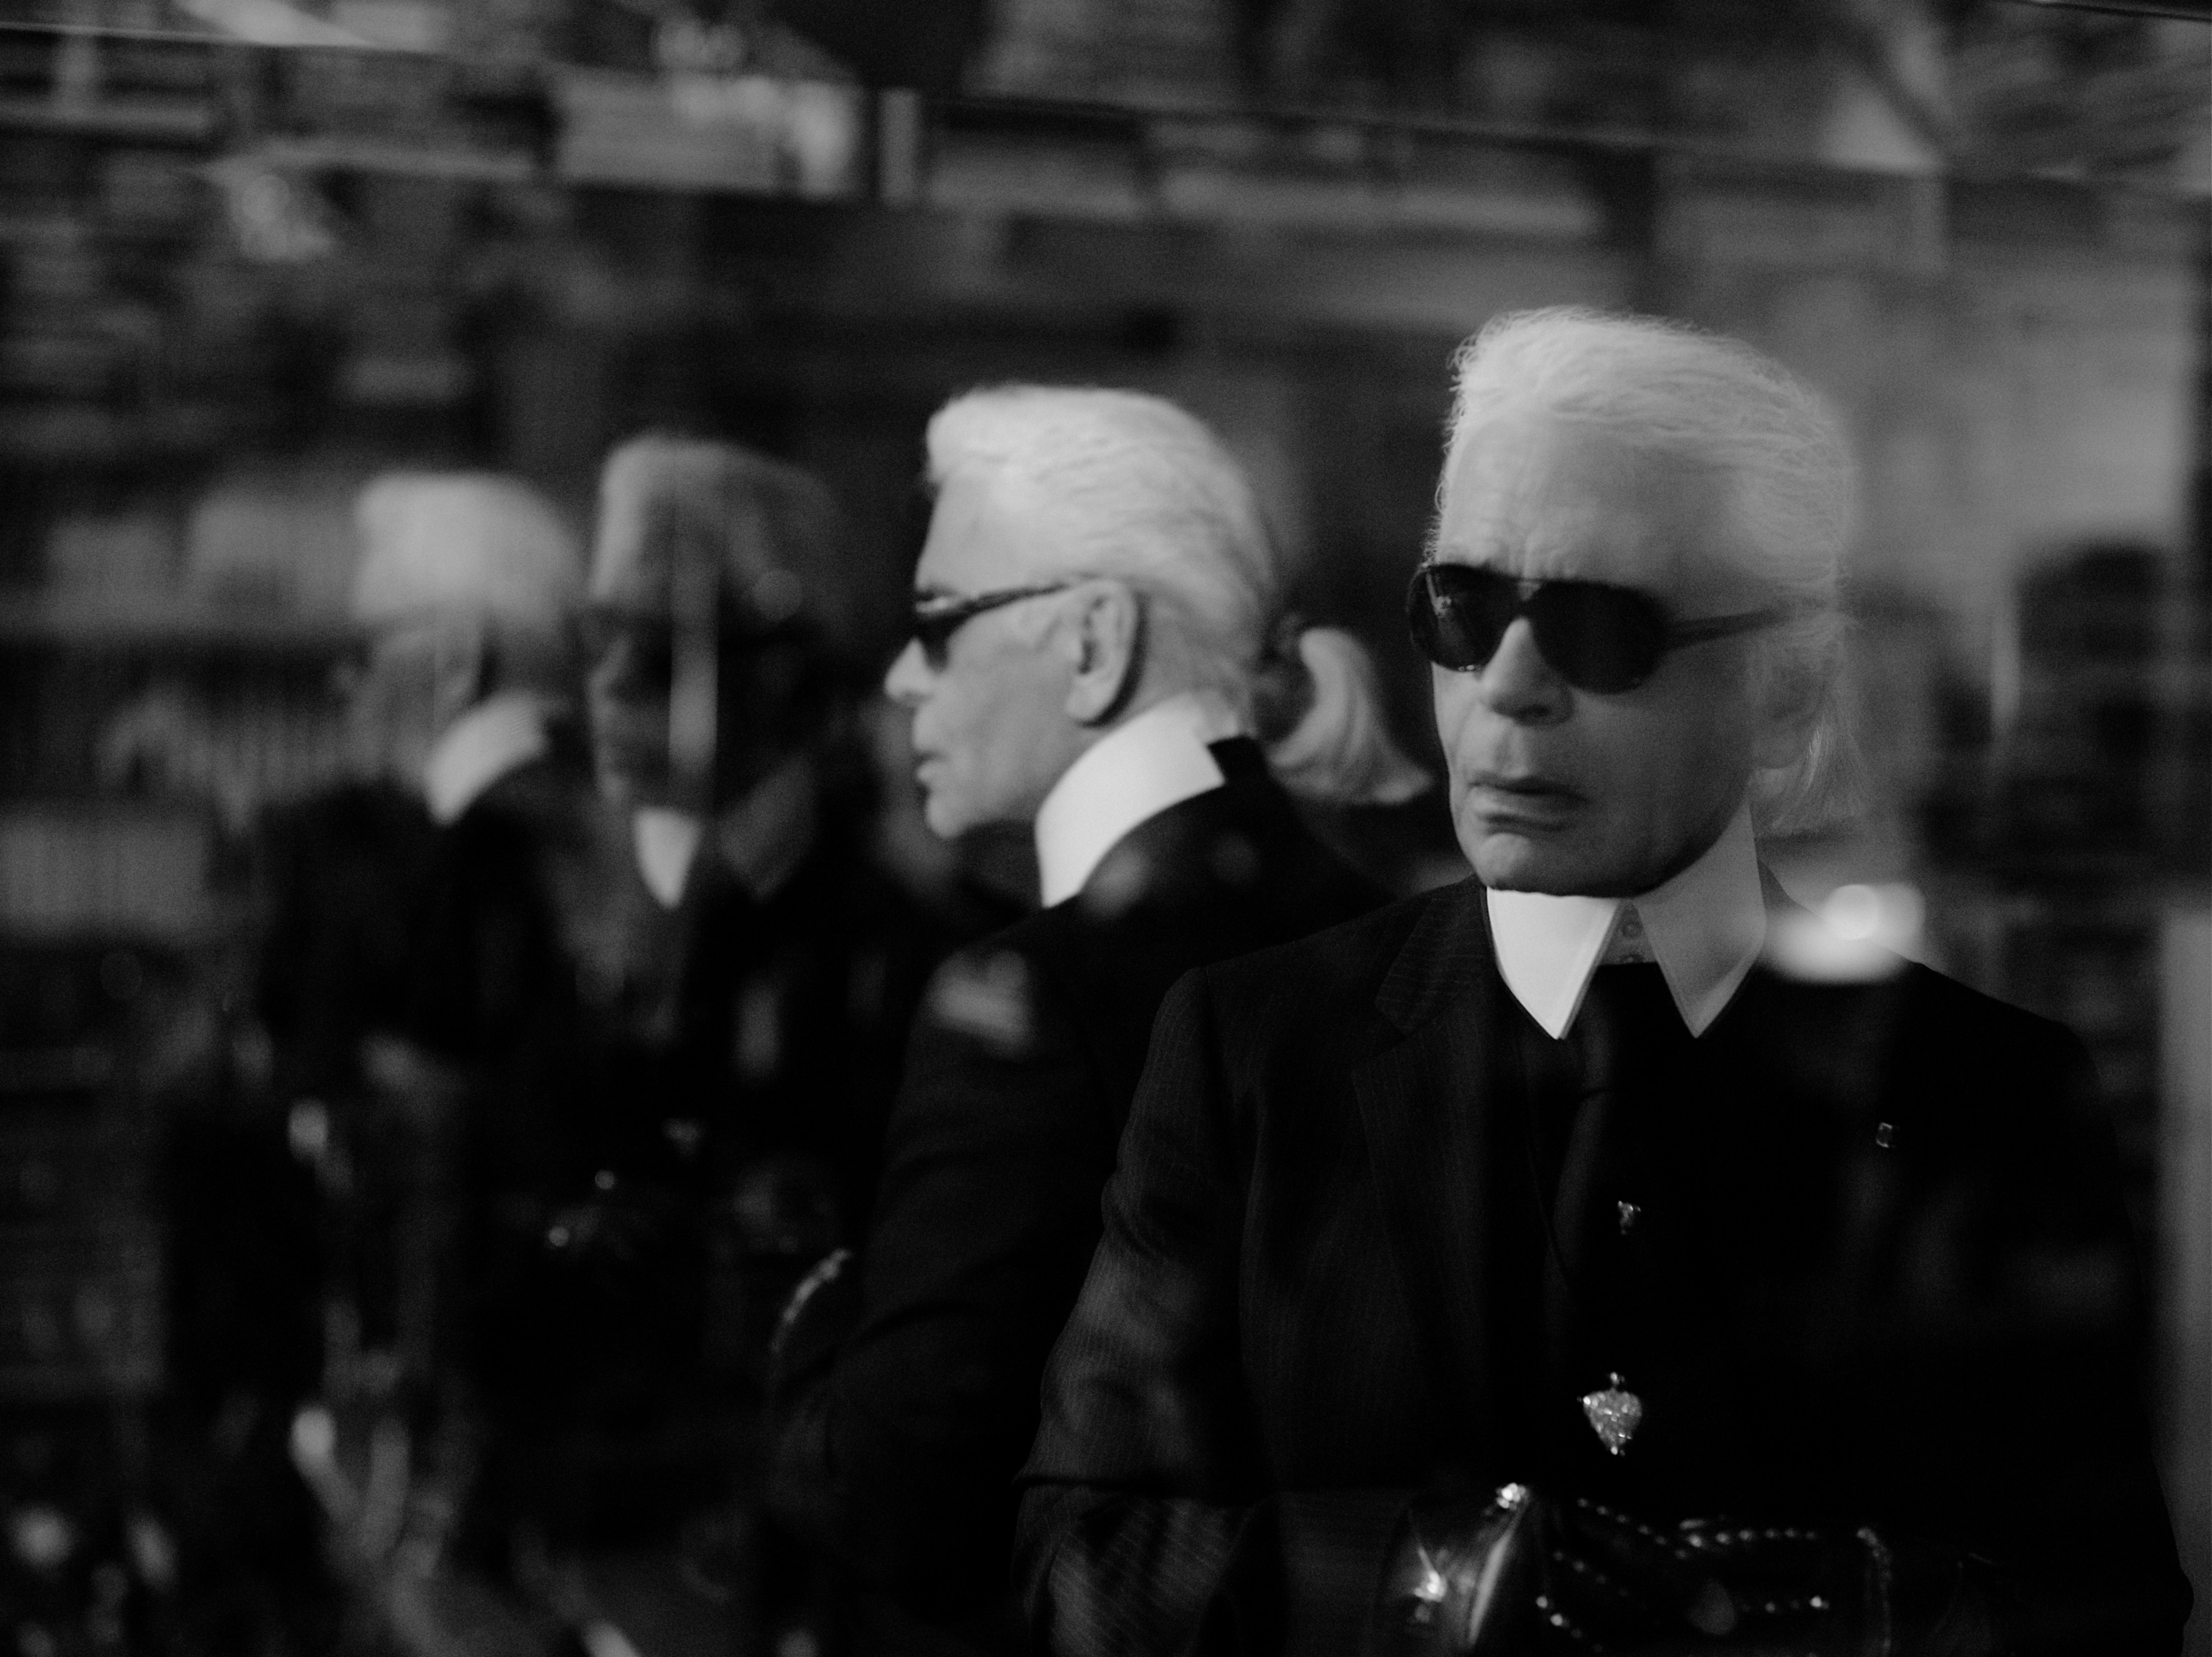 Karl Lagerfeld by PR Newswire